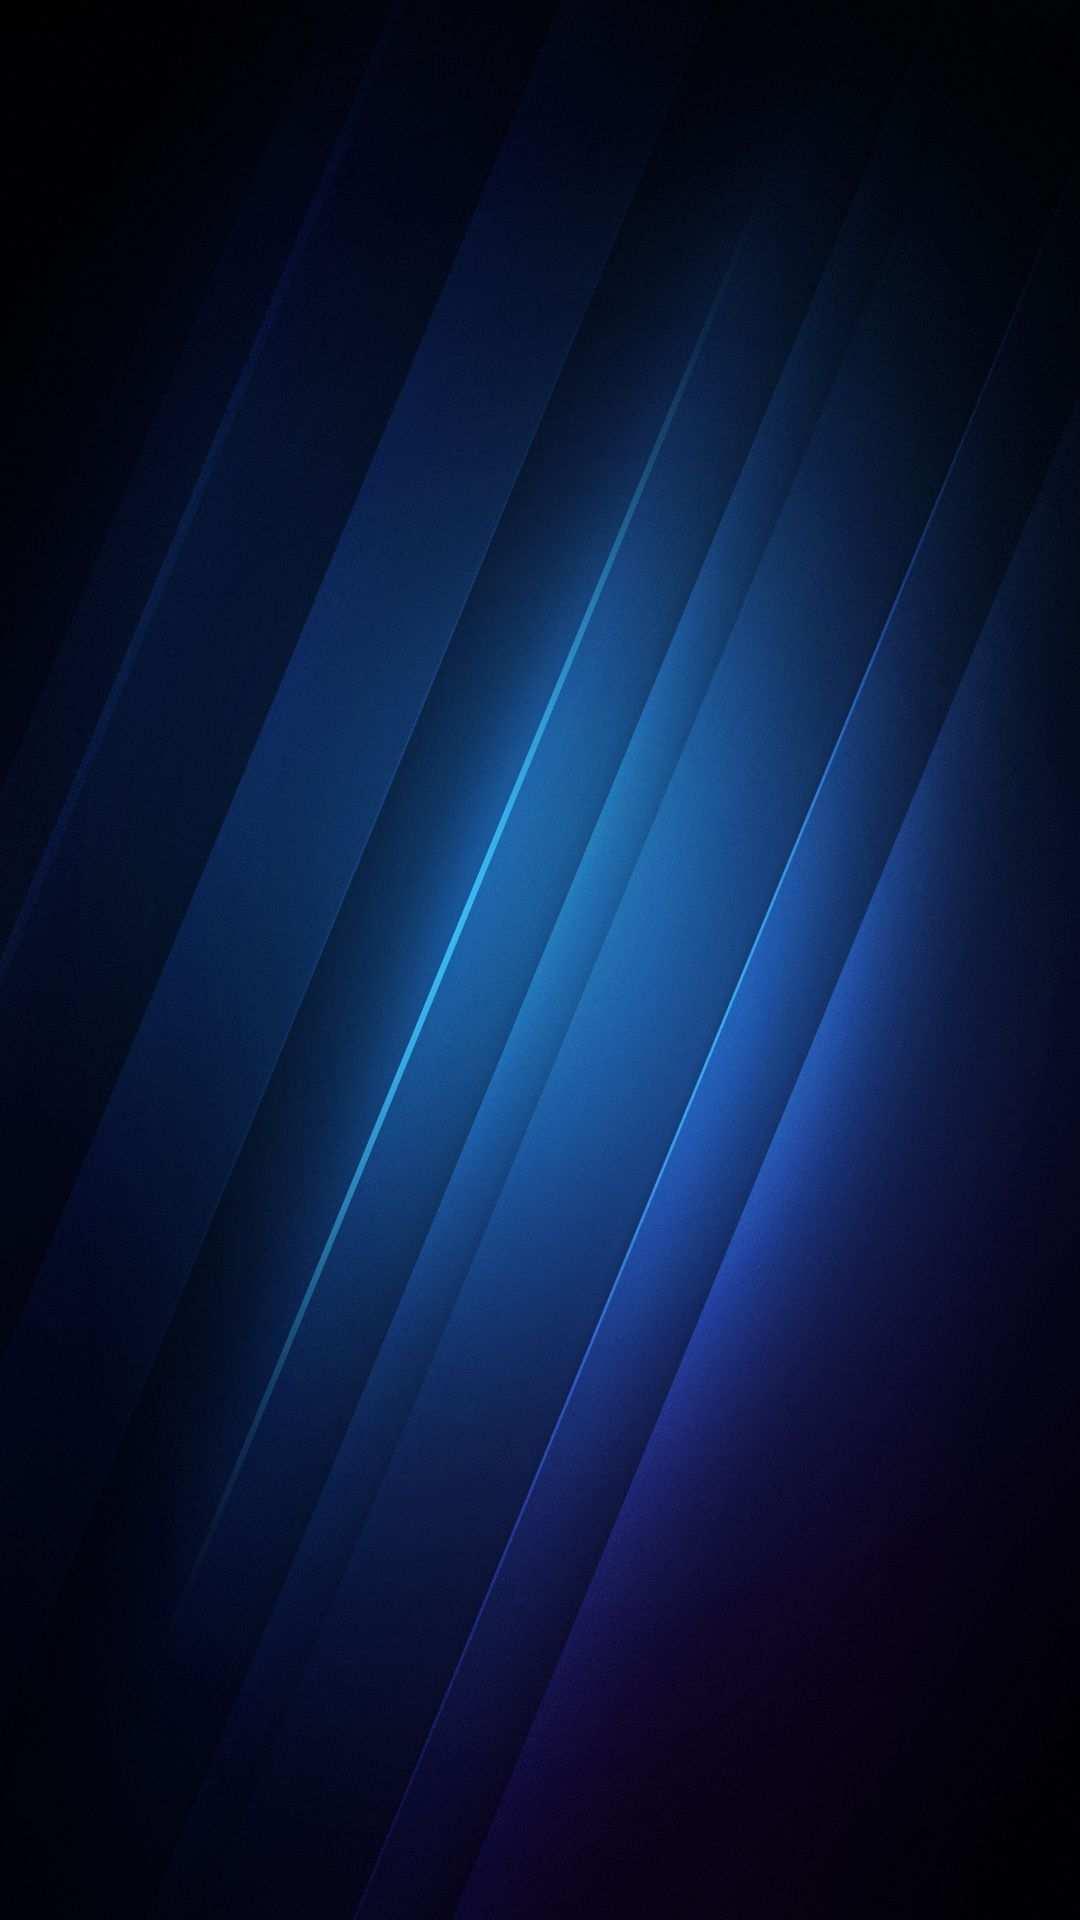 Pin By Sevki Kebelek On Tons De Azul S5 Wallpaper Samsung Wallpaper Android Wallpaper